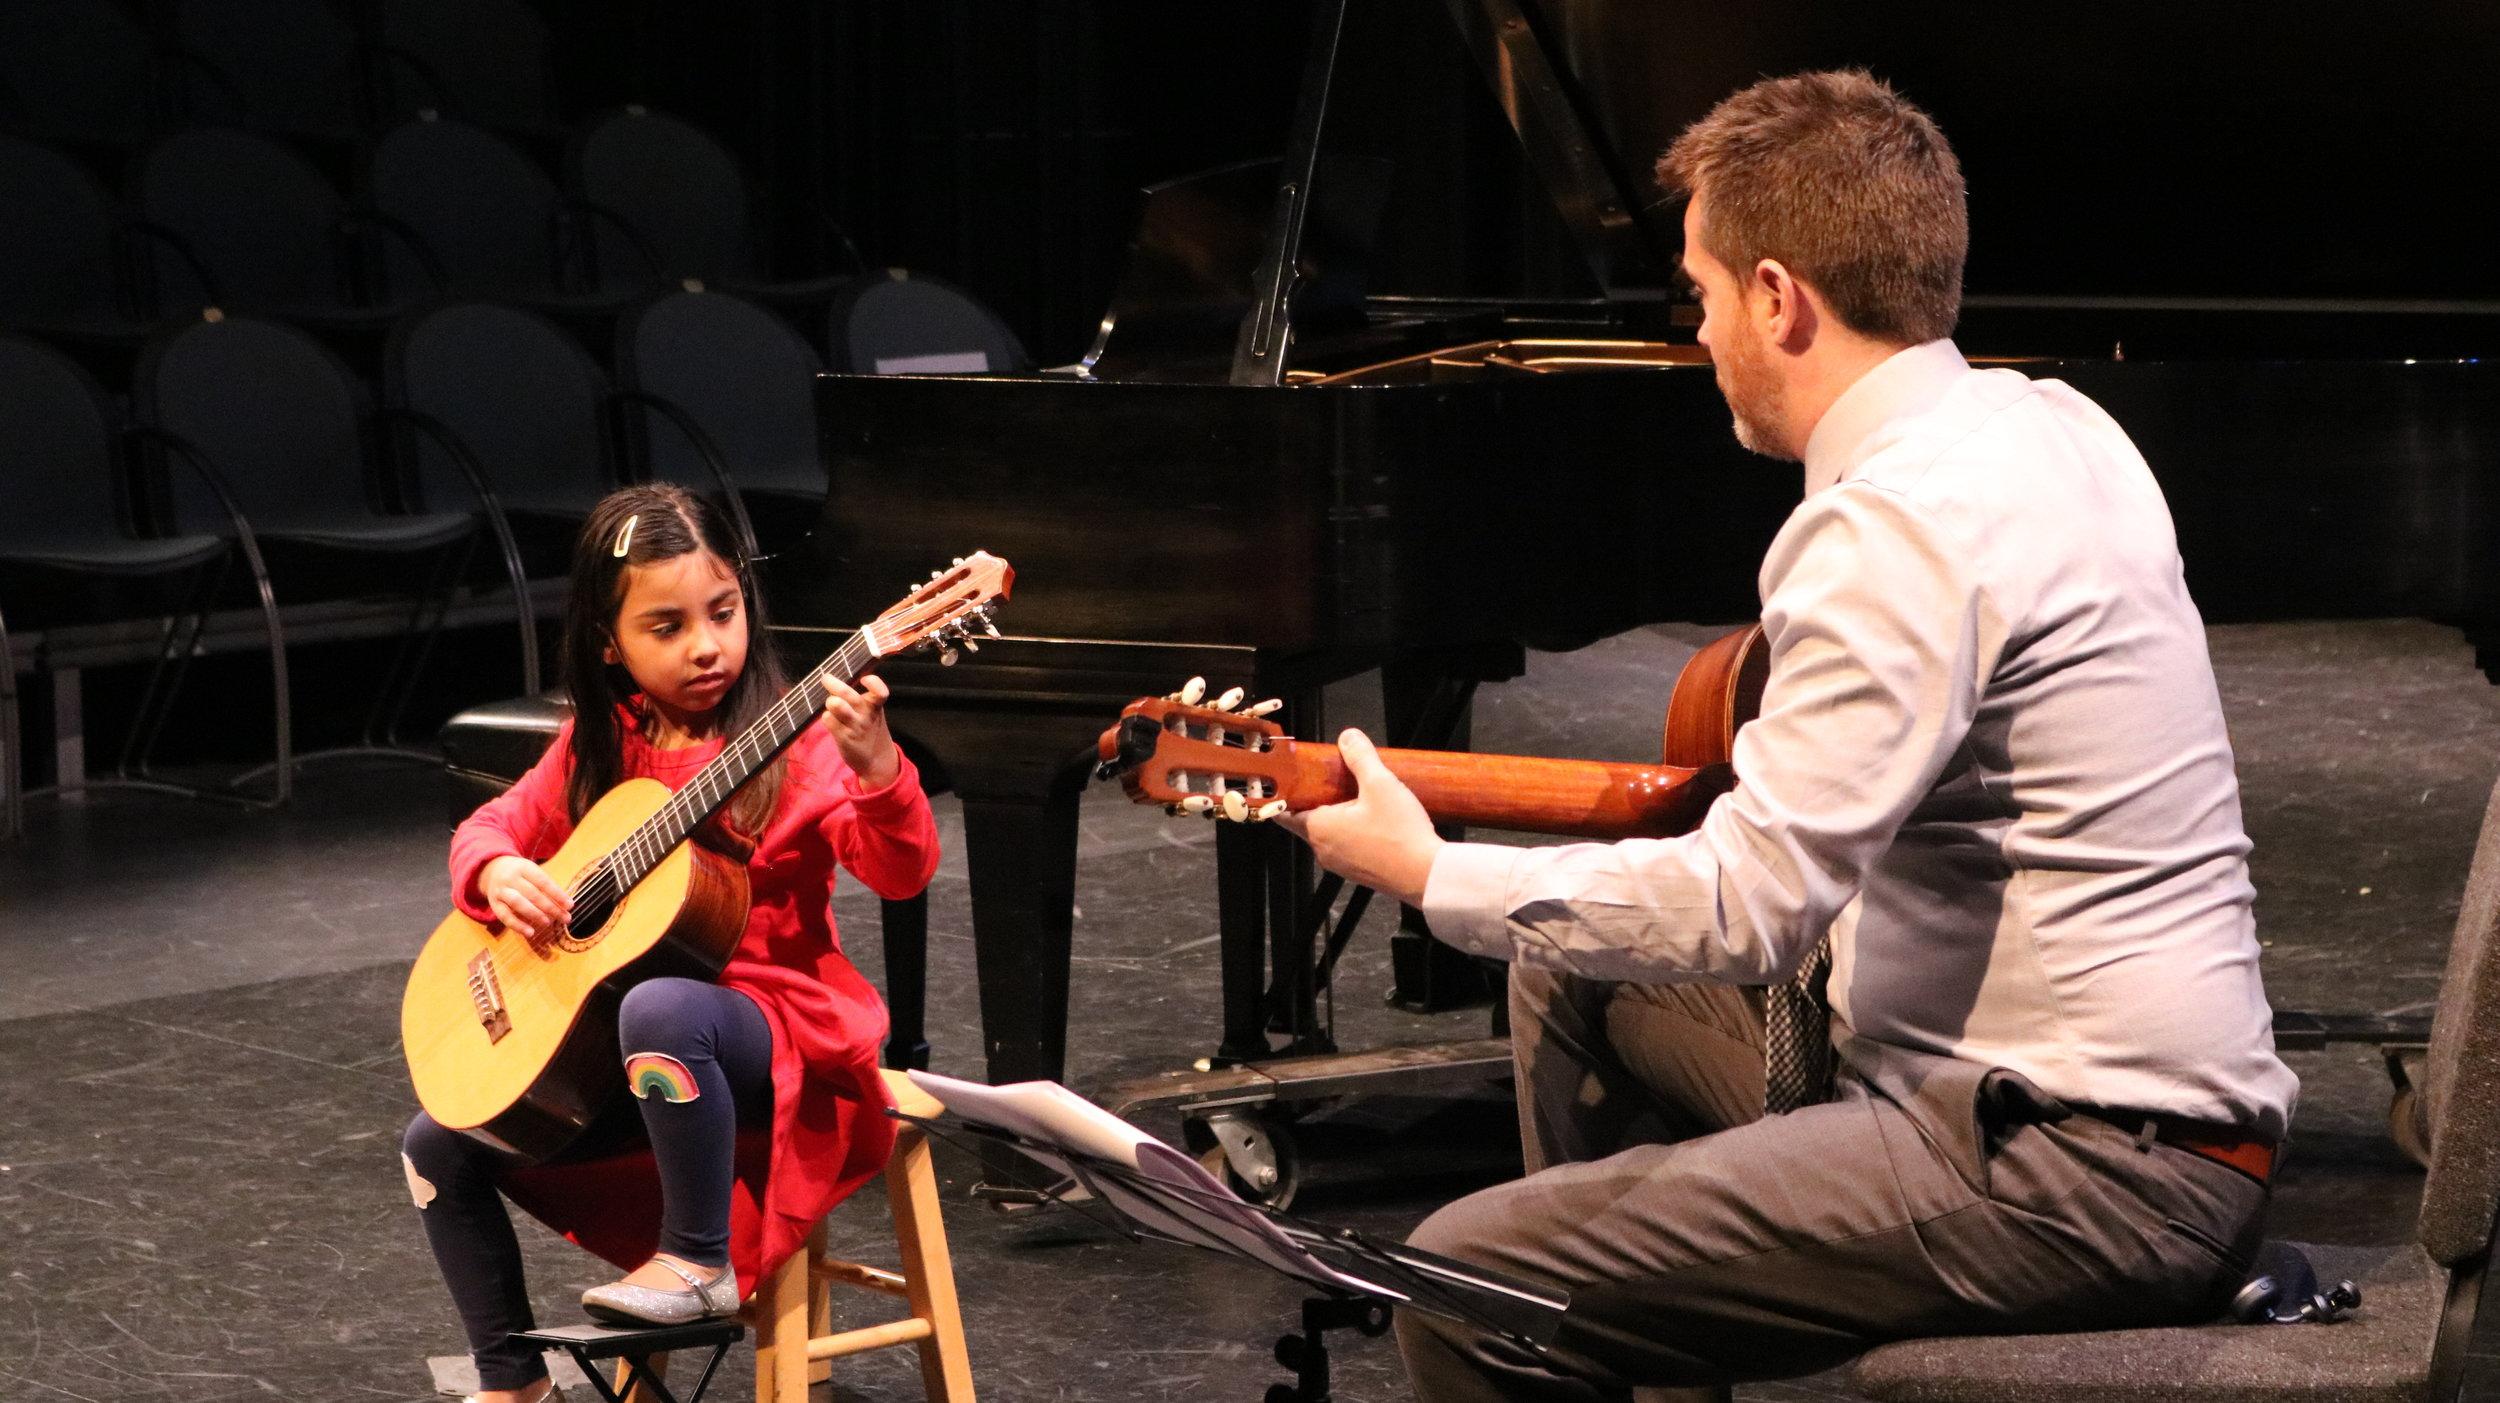 Guitar student and teacher